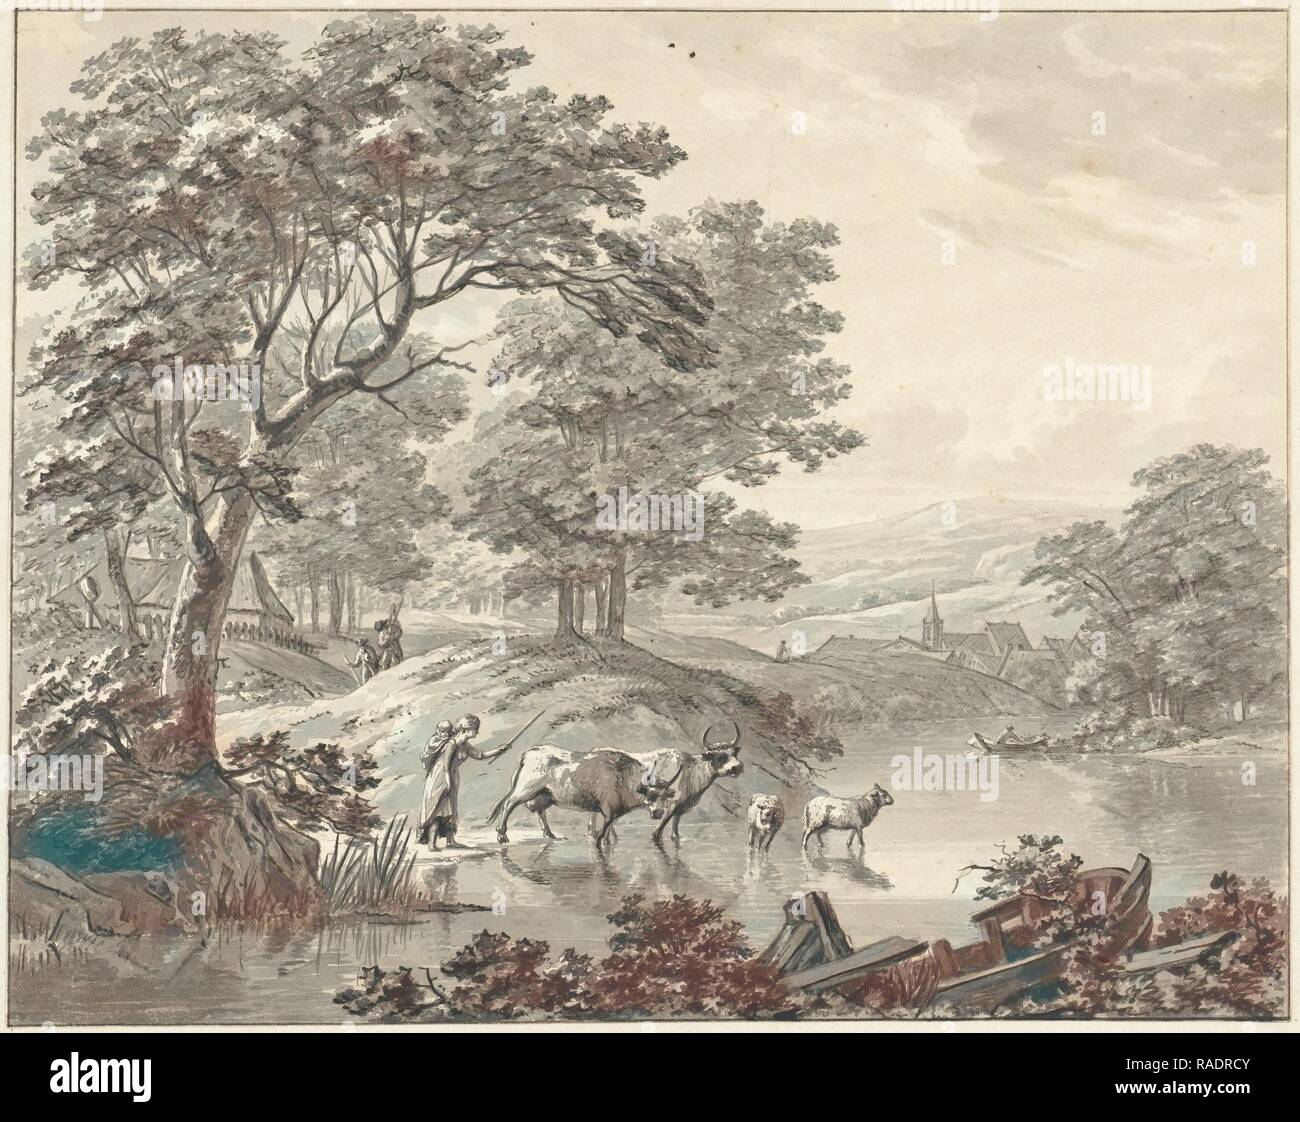 Landscape with cattle by Voorde The Netherlands, Geerlig Grijpmoed, 1754 -  182. Reimagined